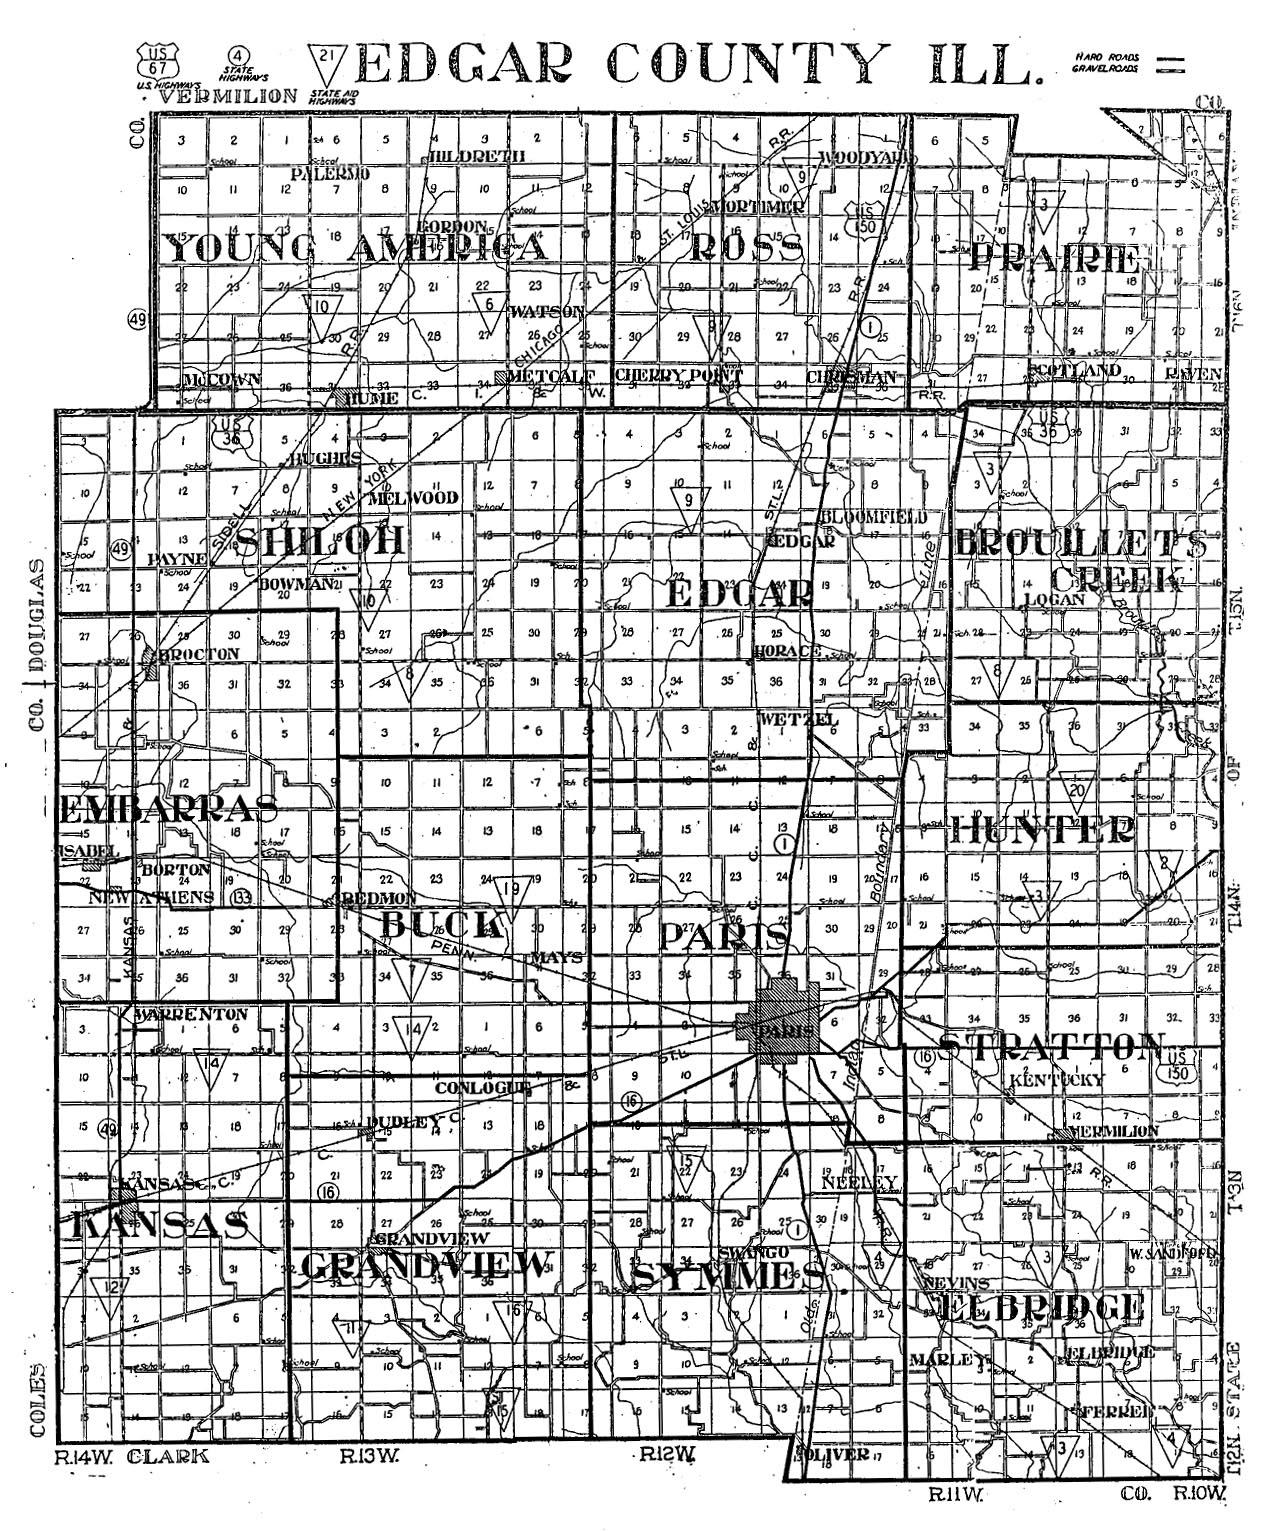 Illinois edgar county kansas -  Grandview Hunter Kansas Paris Prairie Ross Shiloh Pt 1 Shiloh Pt 2 Stratton Young America Pt 1 Young America Pt 2 Edgar County Il